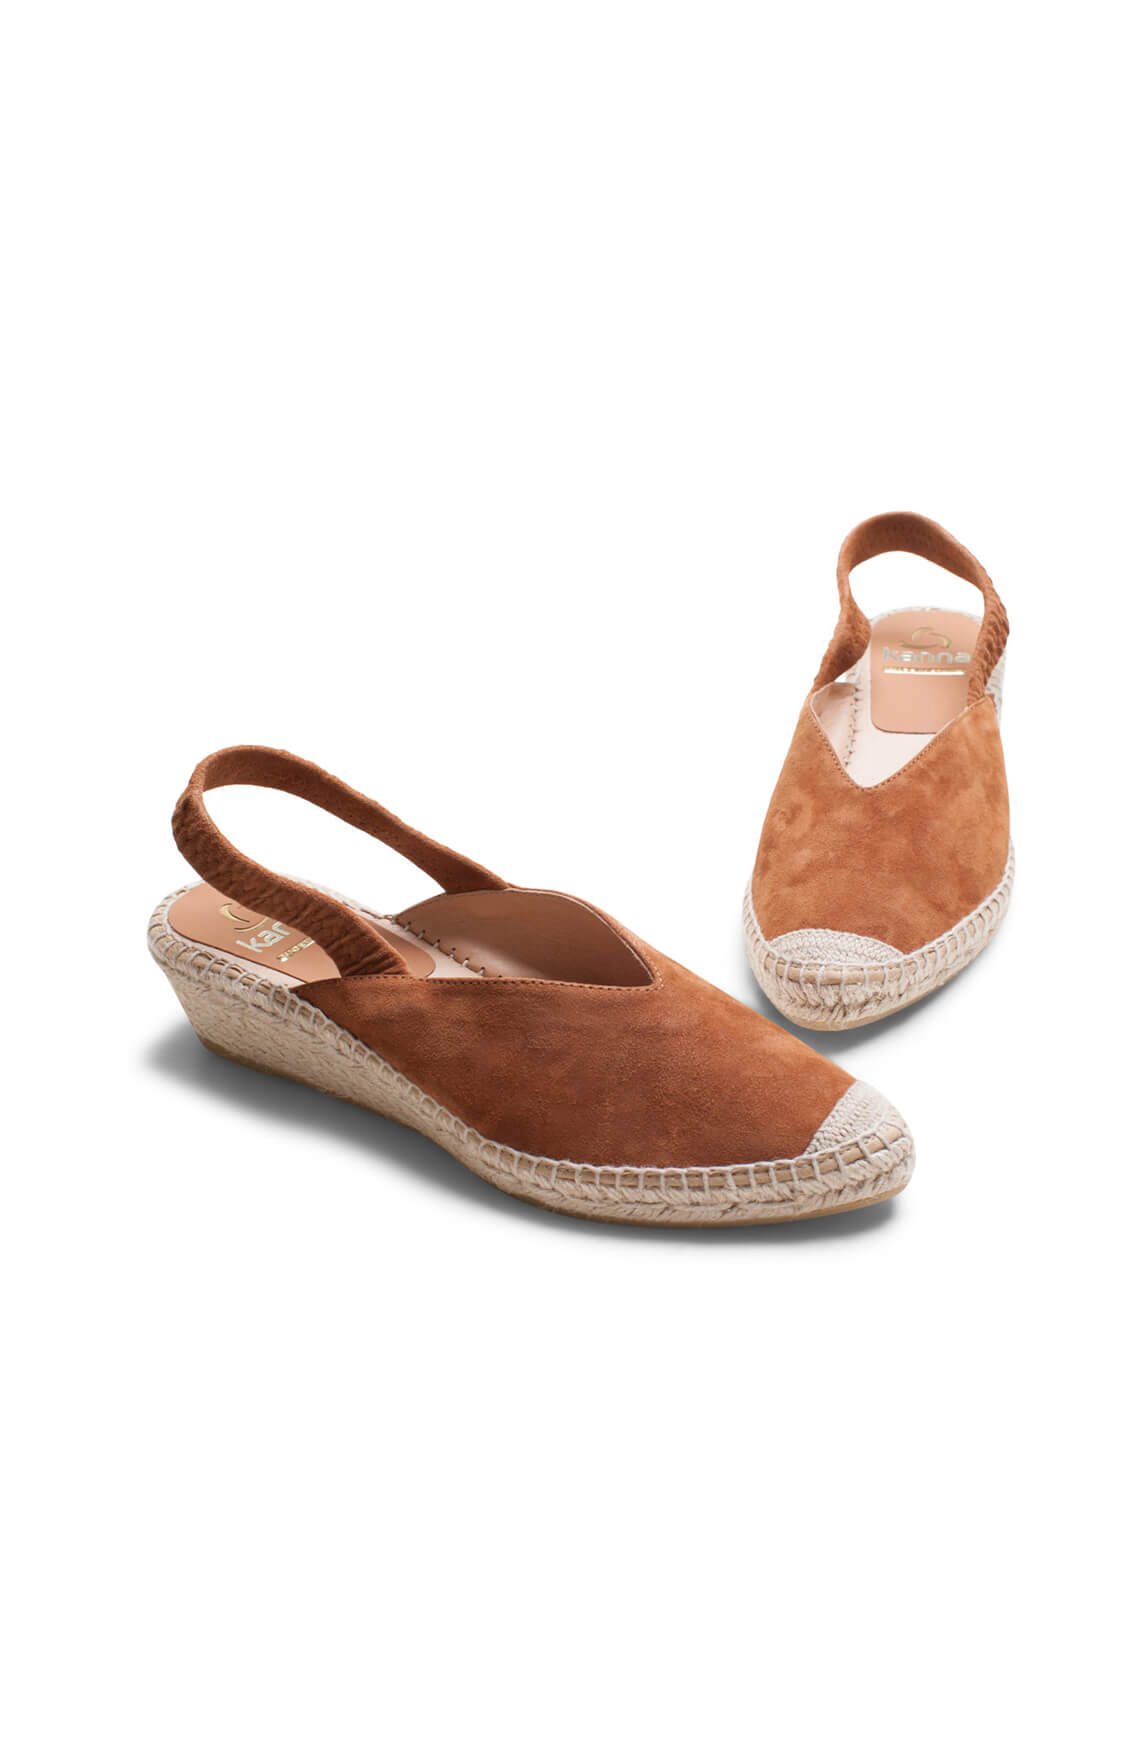 Kanna Dames Suède sandaal Bruin